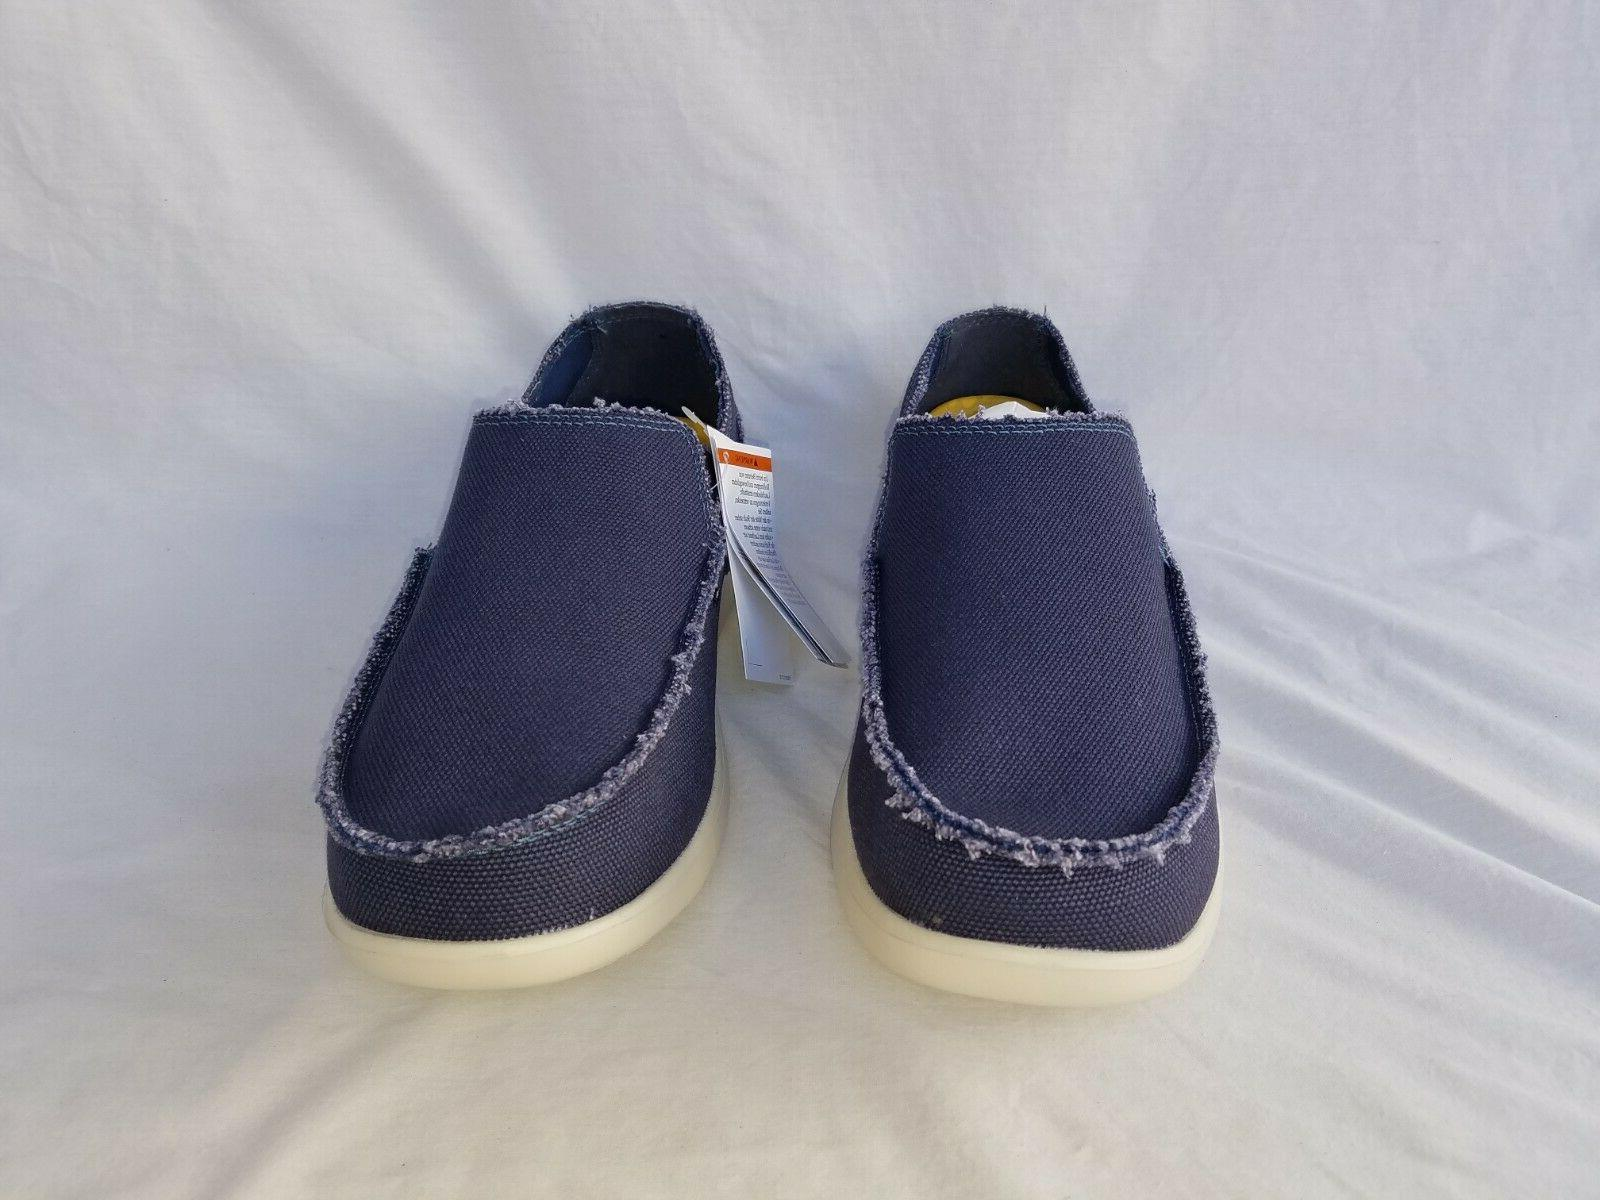 New Crocs Cruz Slip Loafers Navy Stucco